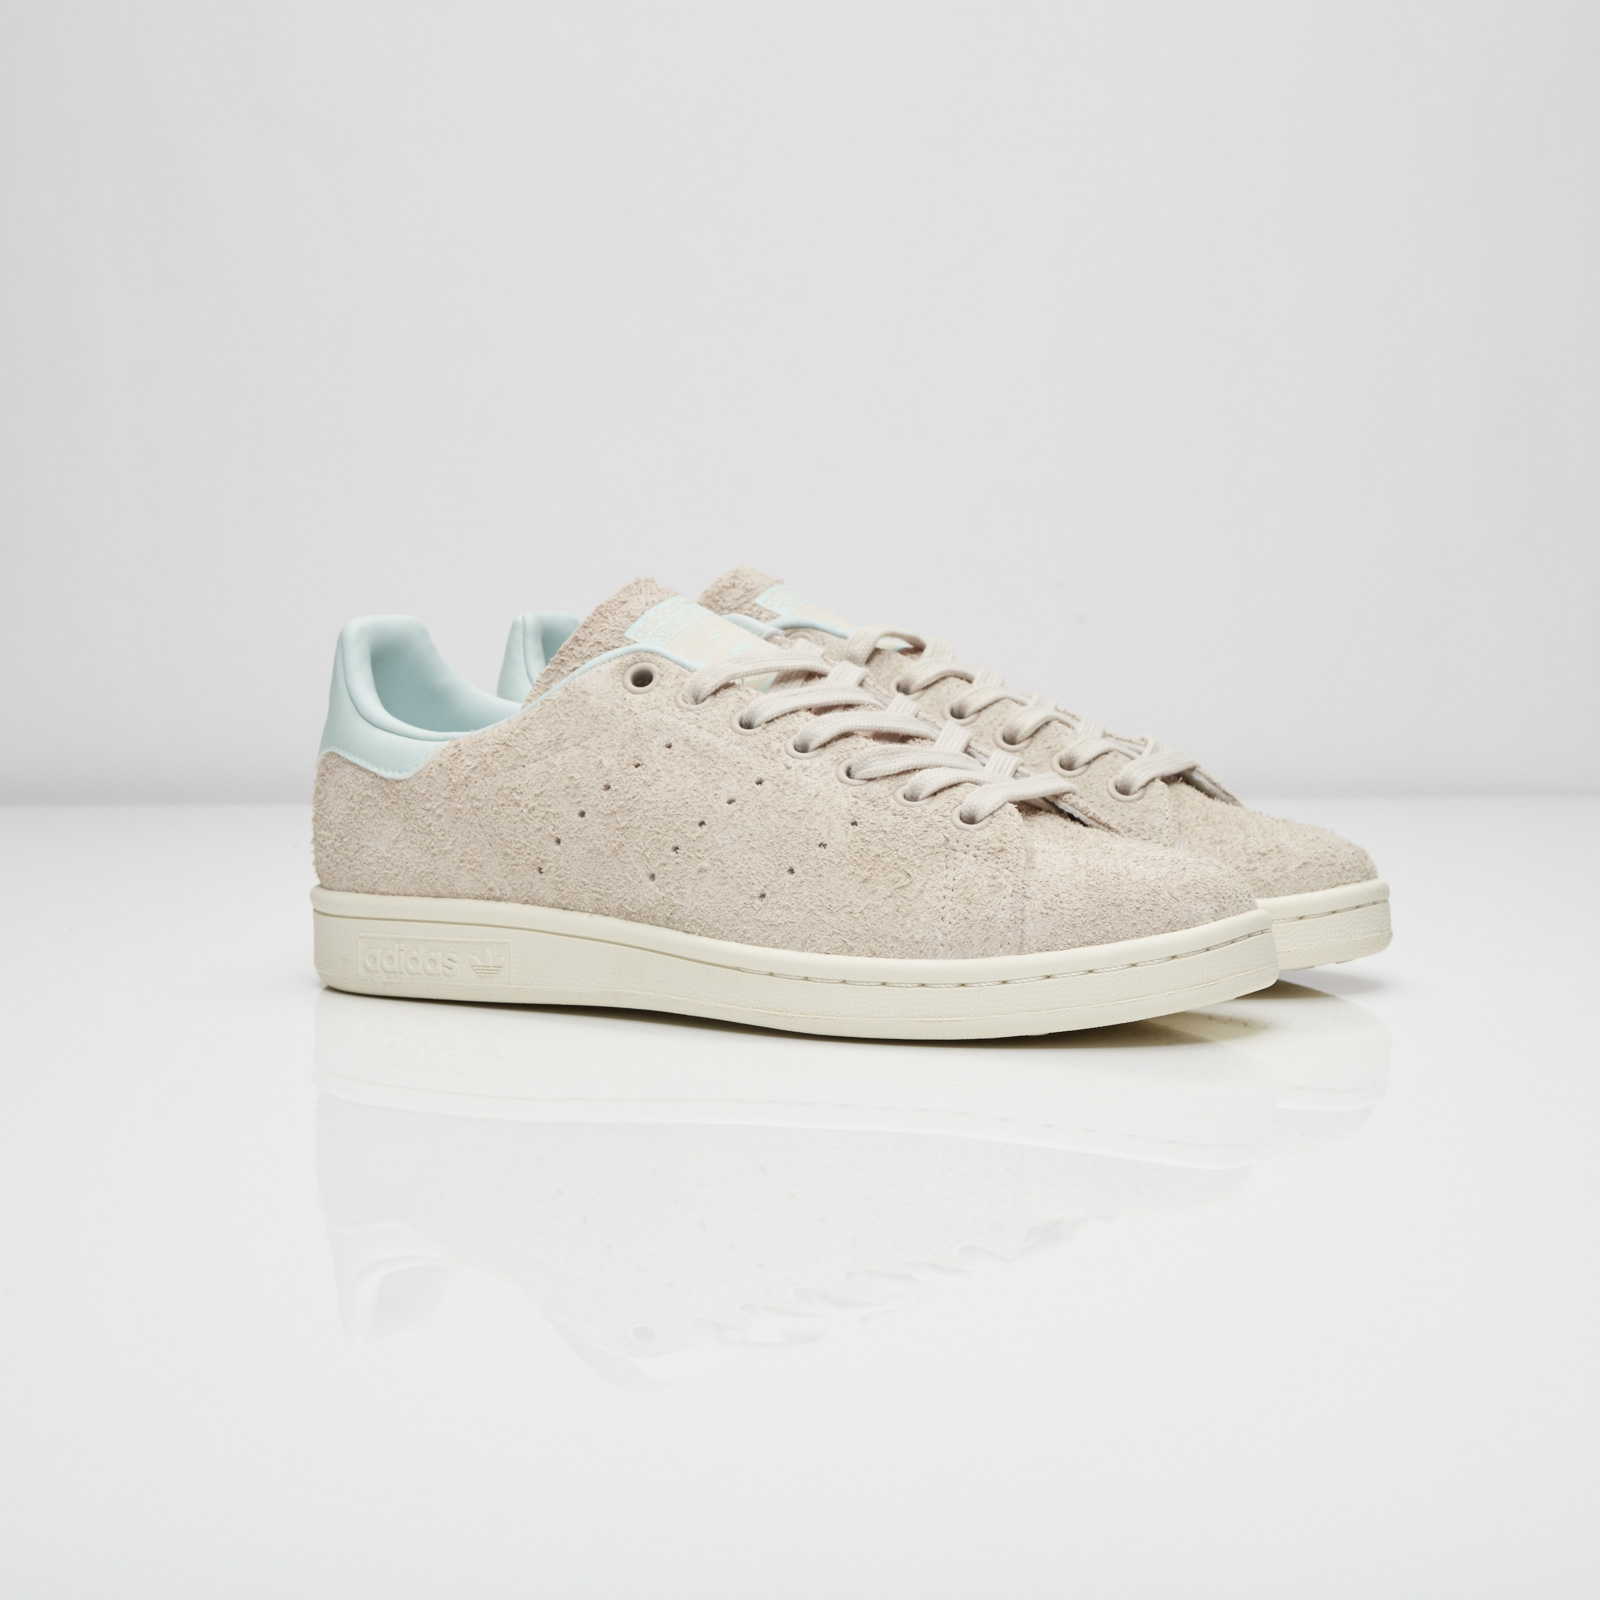 ADIDAS STAN SMITH women clear brown vapor green Sneaker